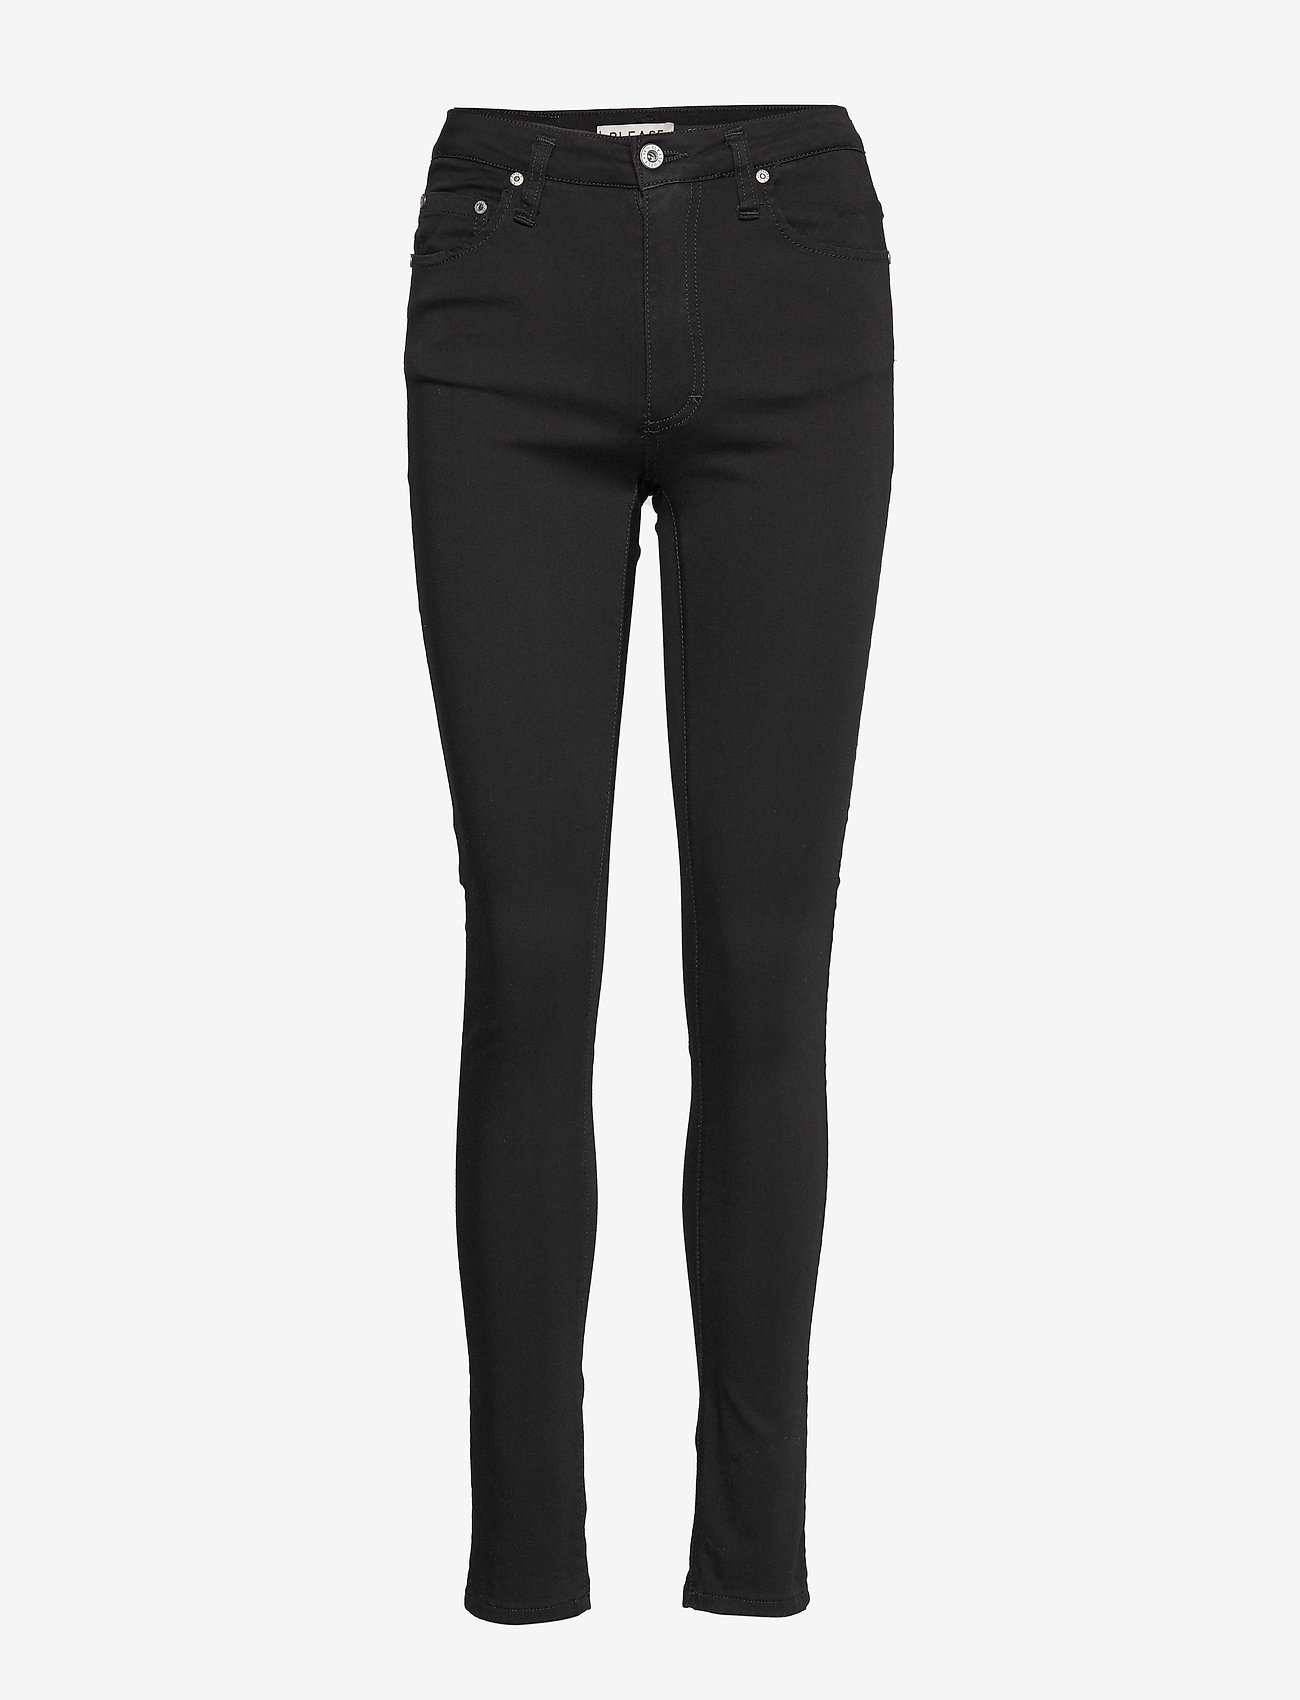 Please Jeans - SLENDER SILK TOUCH - slim fit bukser - 9000 nero - 0